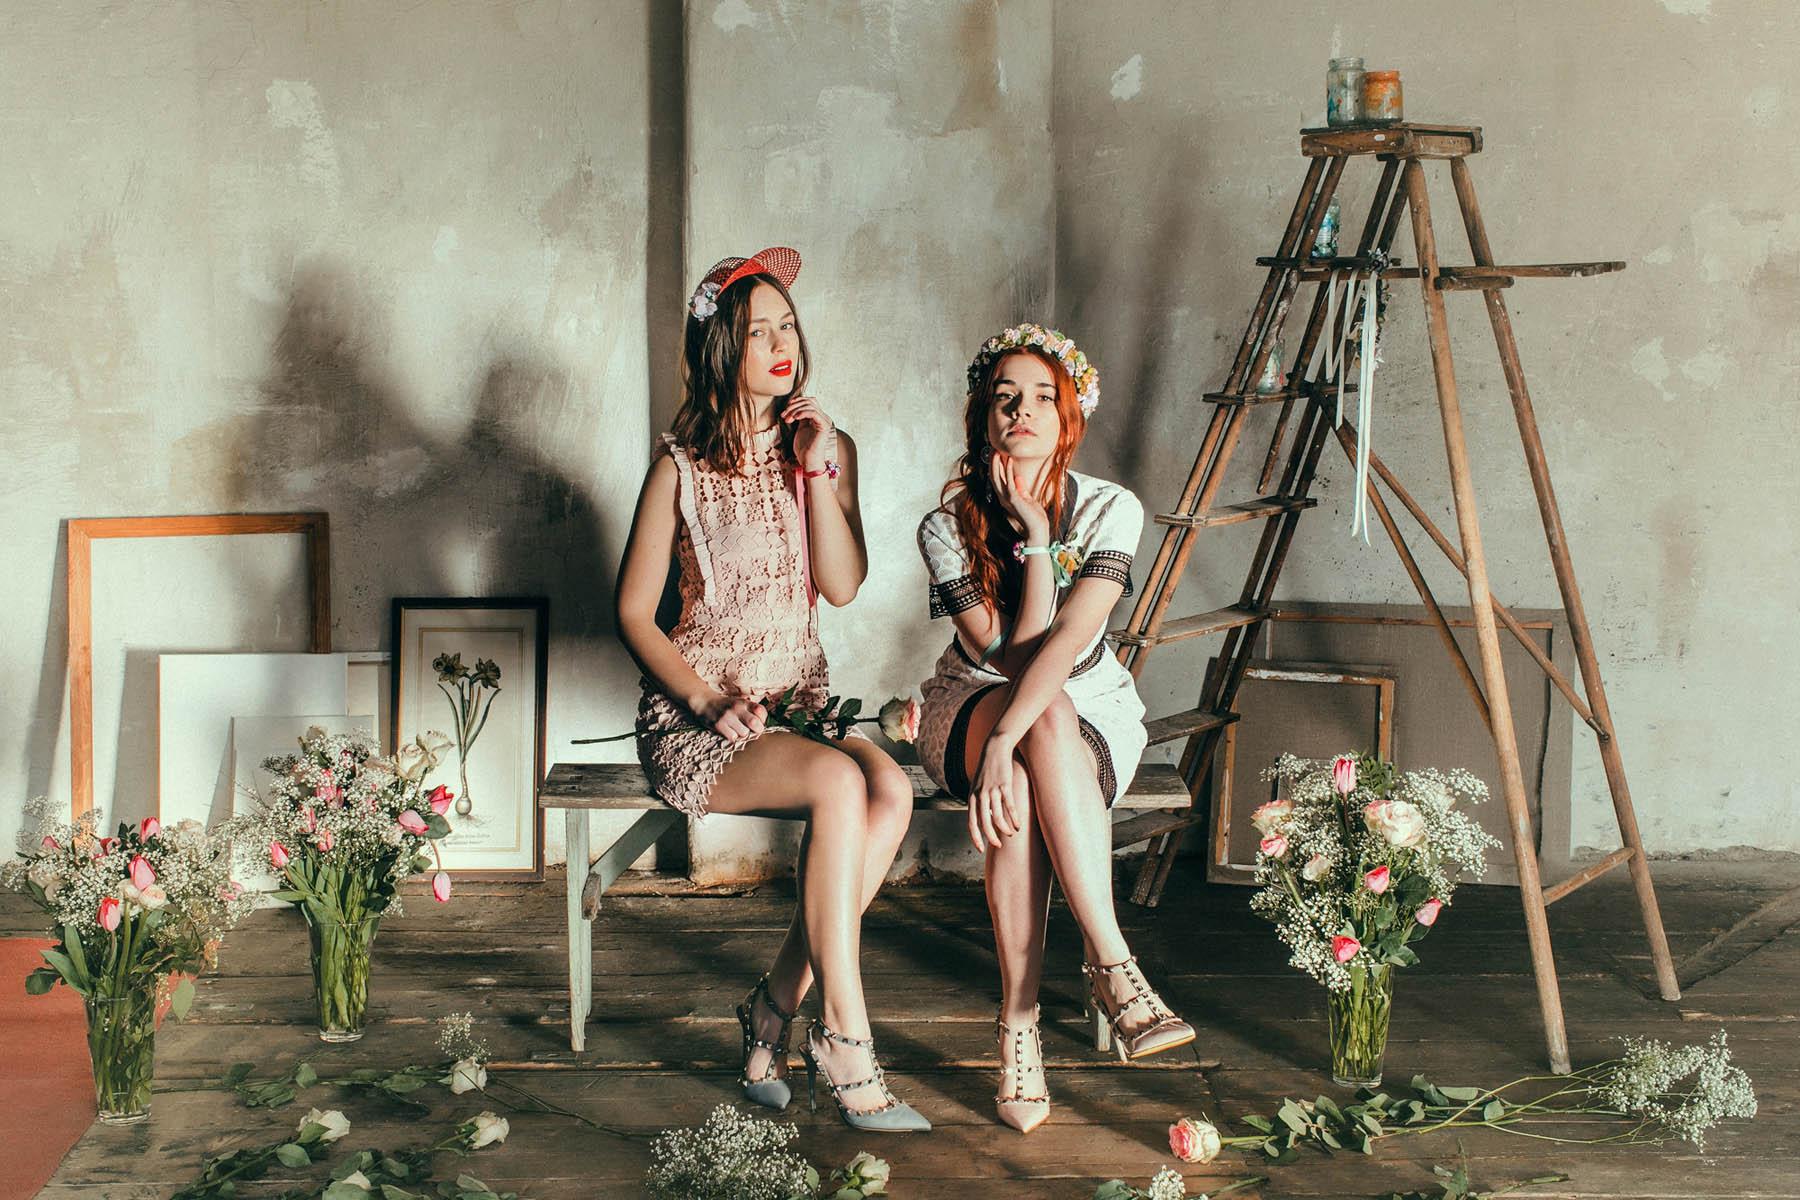 We-Are-Flowergirls_Lookbook_Flowercrown_Blumenkranz_SS17_c_Lupi-Spuma_Web_05.jpg